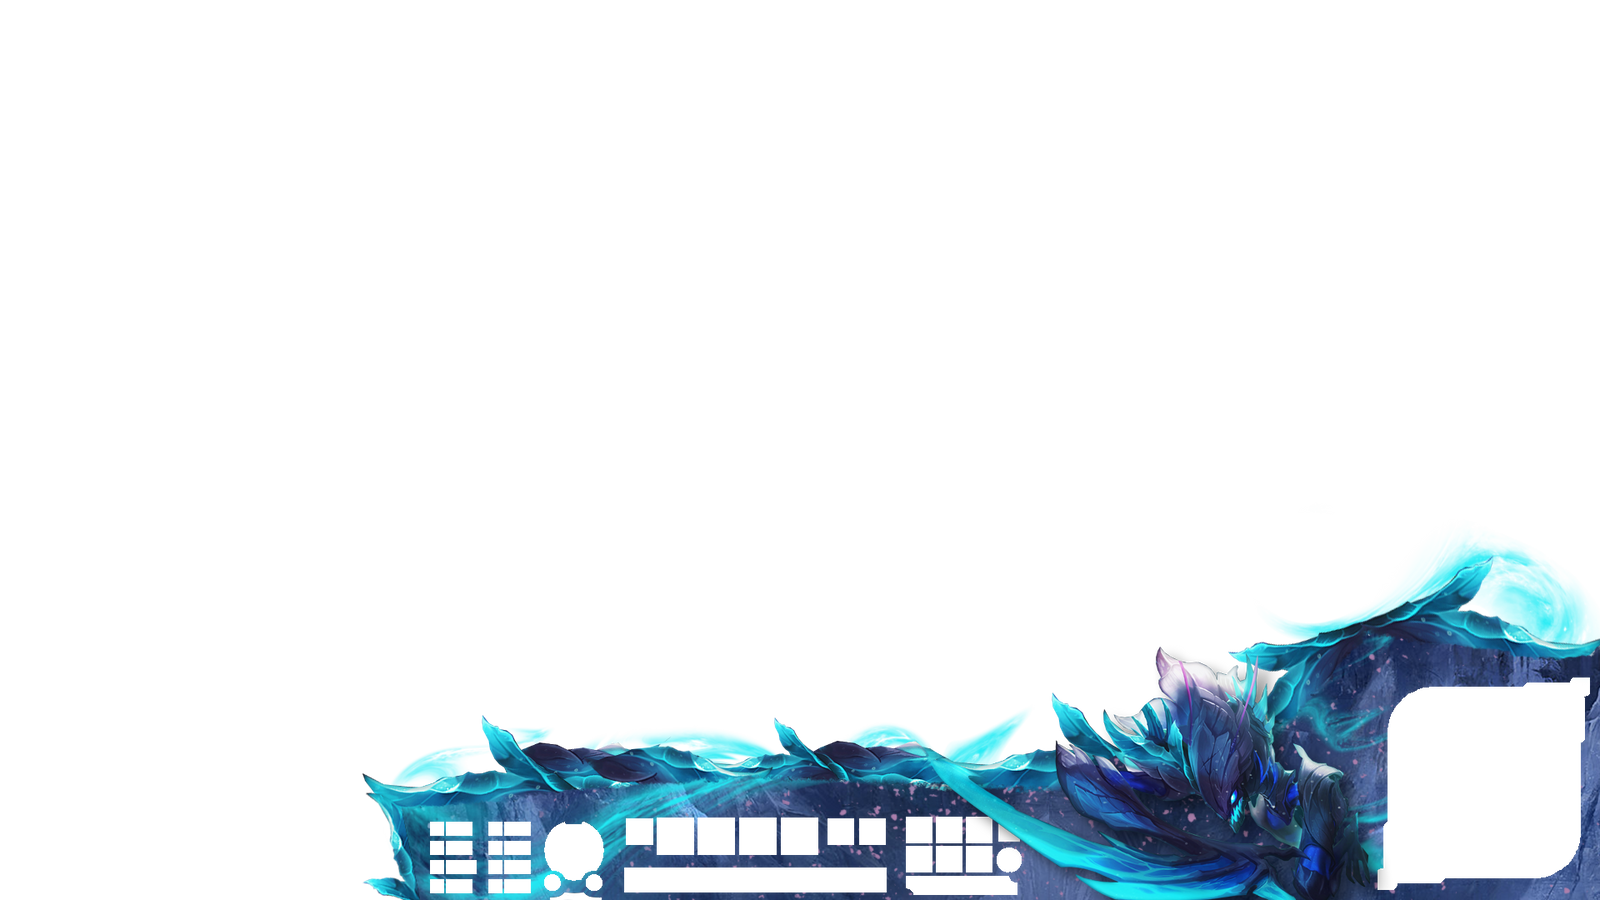 League of legend Overlay Kha'zix Death Blossom by h4nabi